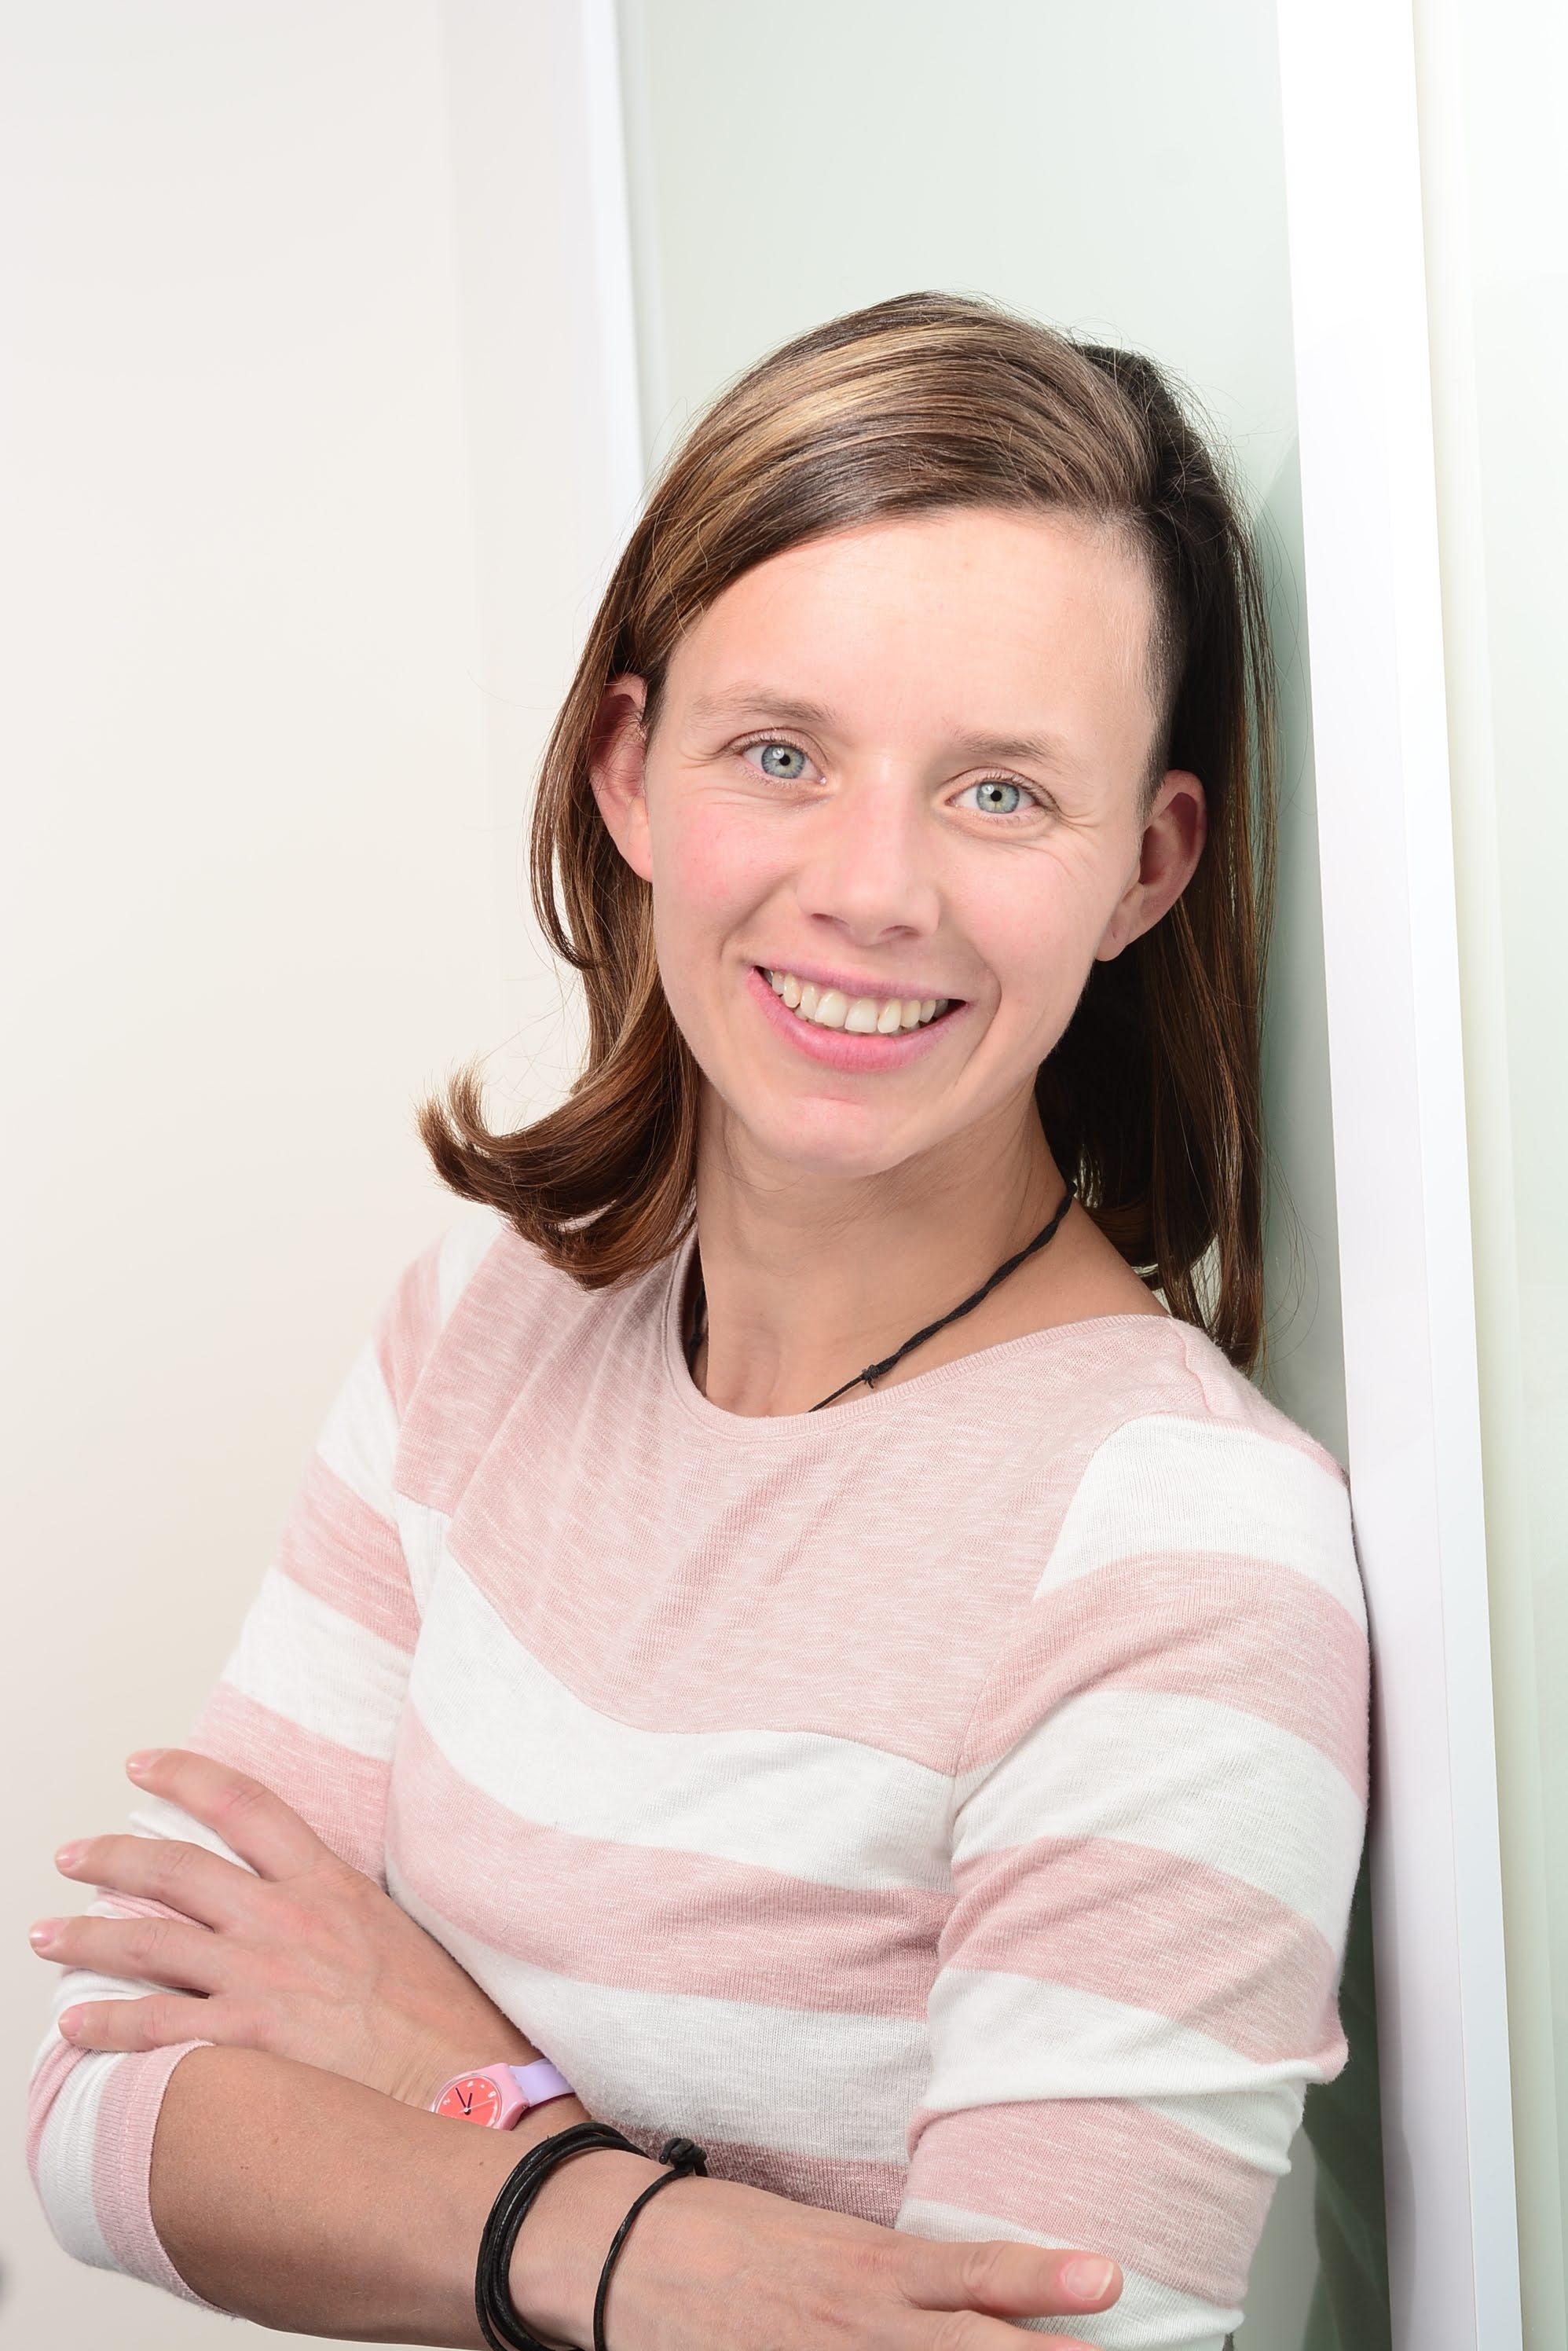 Gordion Projects, Franziska Dierick, Projektmanagement, IT Beratung, Projektberatung, Projektleitung, Projektberater